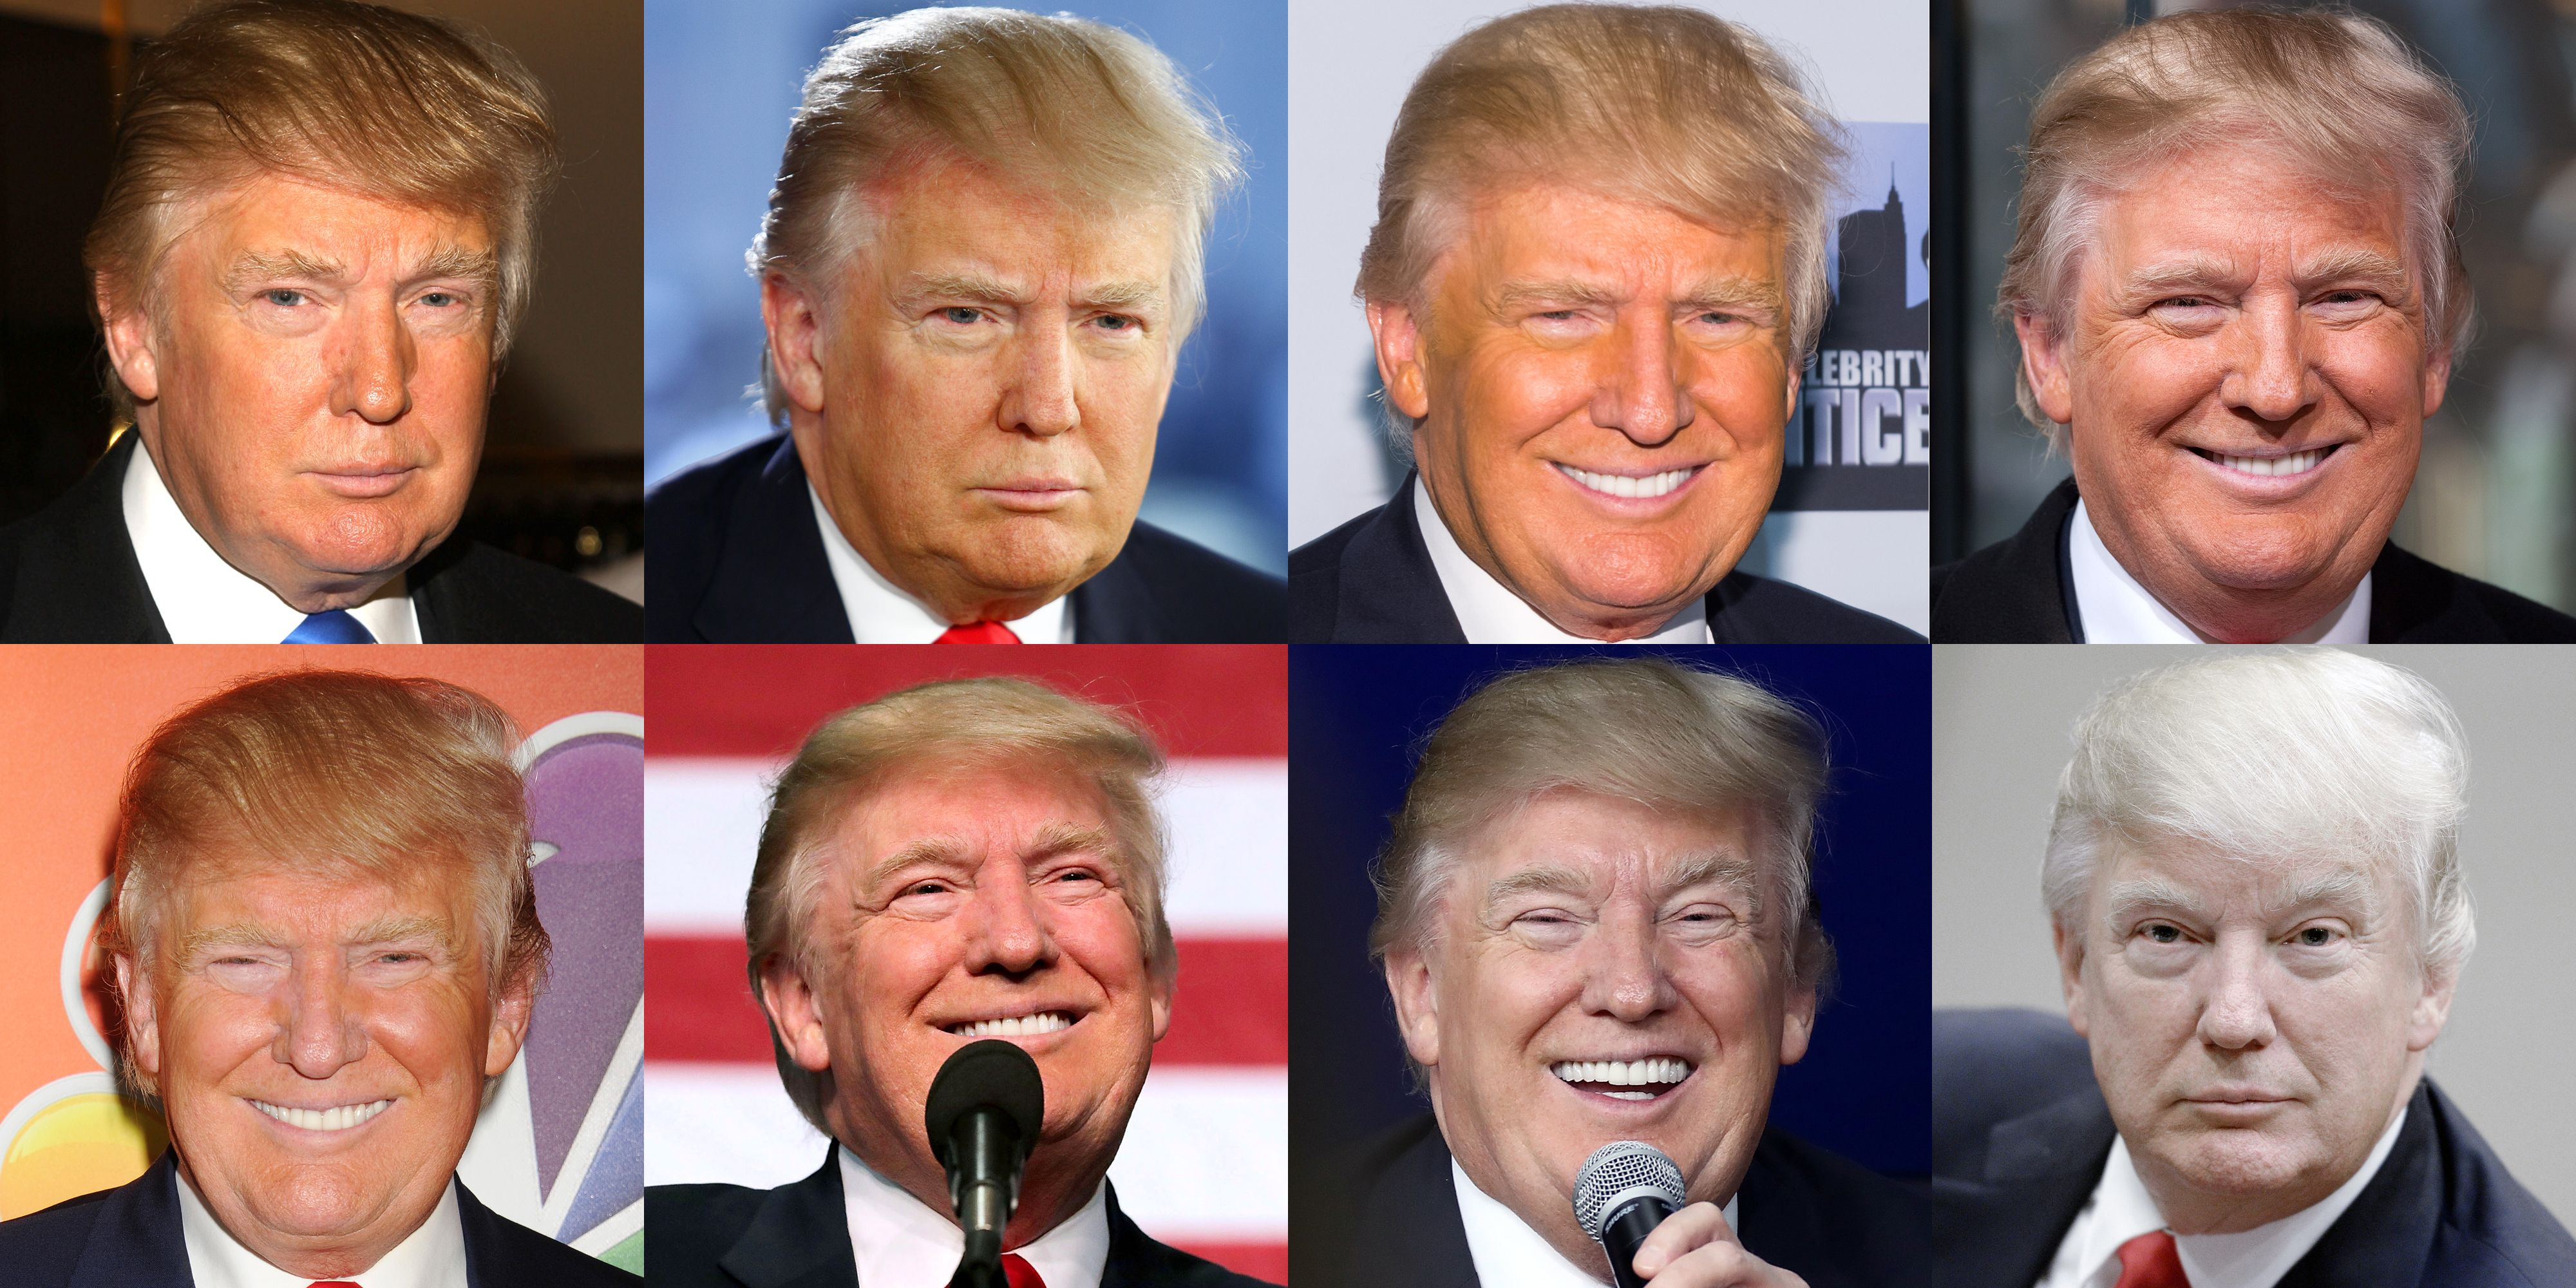 ab1b6384c5d8 Does Donald Trump Spray Tan  - Tracking Donald Trump s Fading Tan